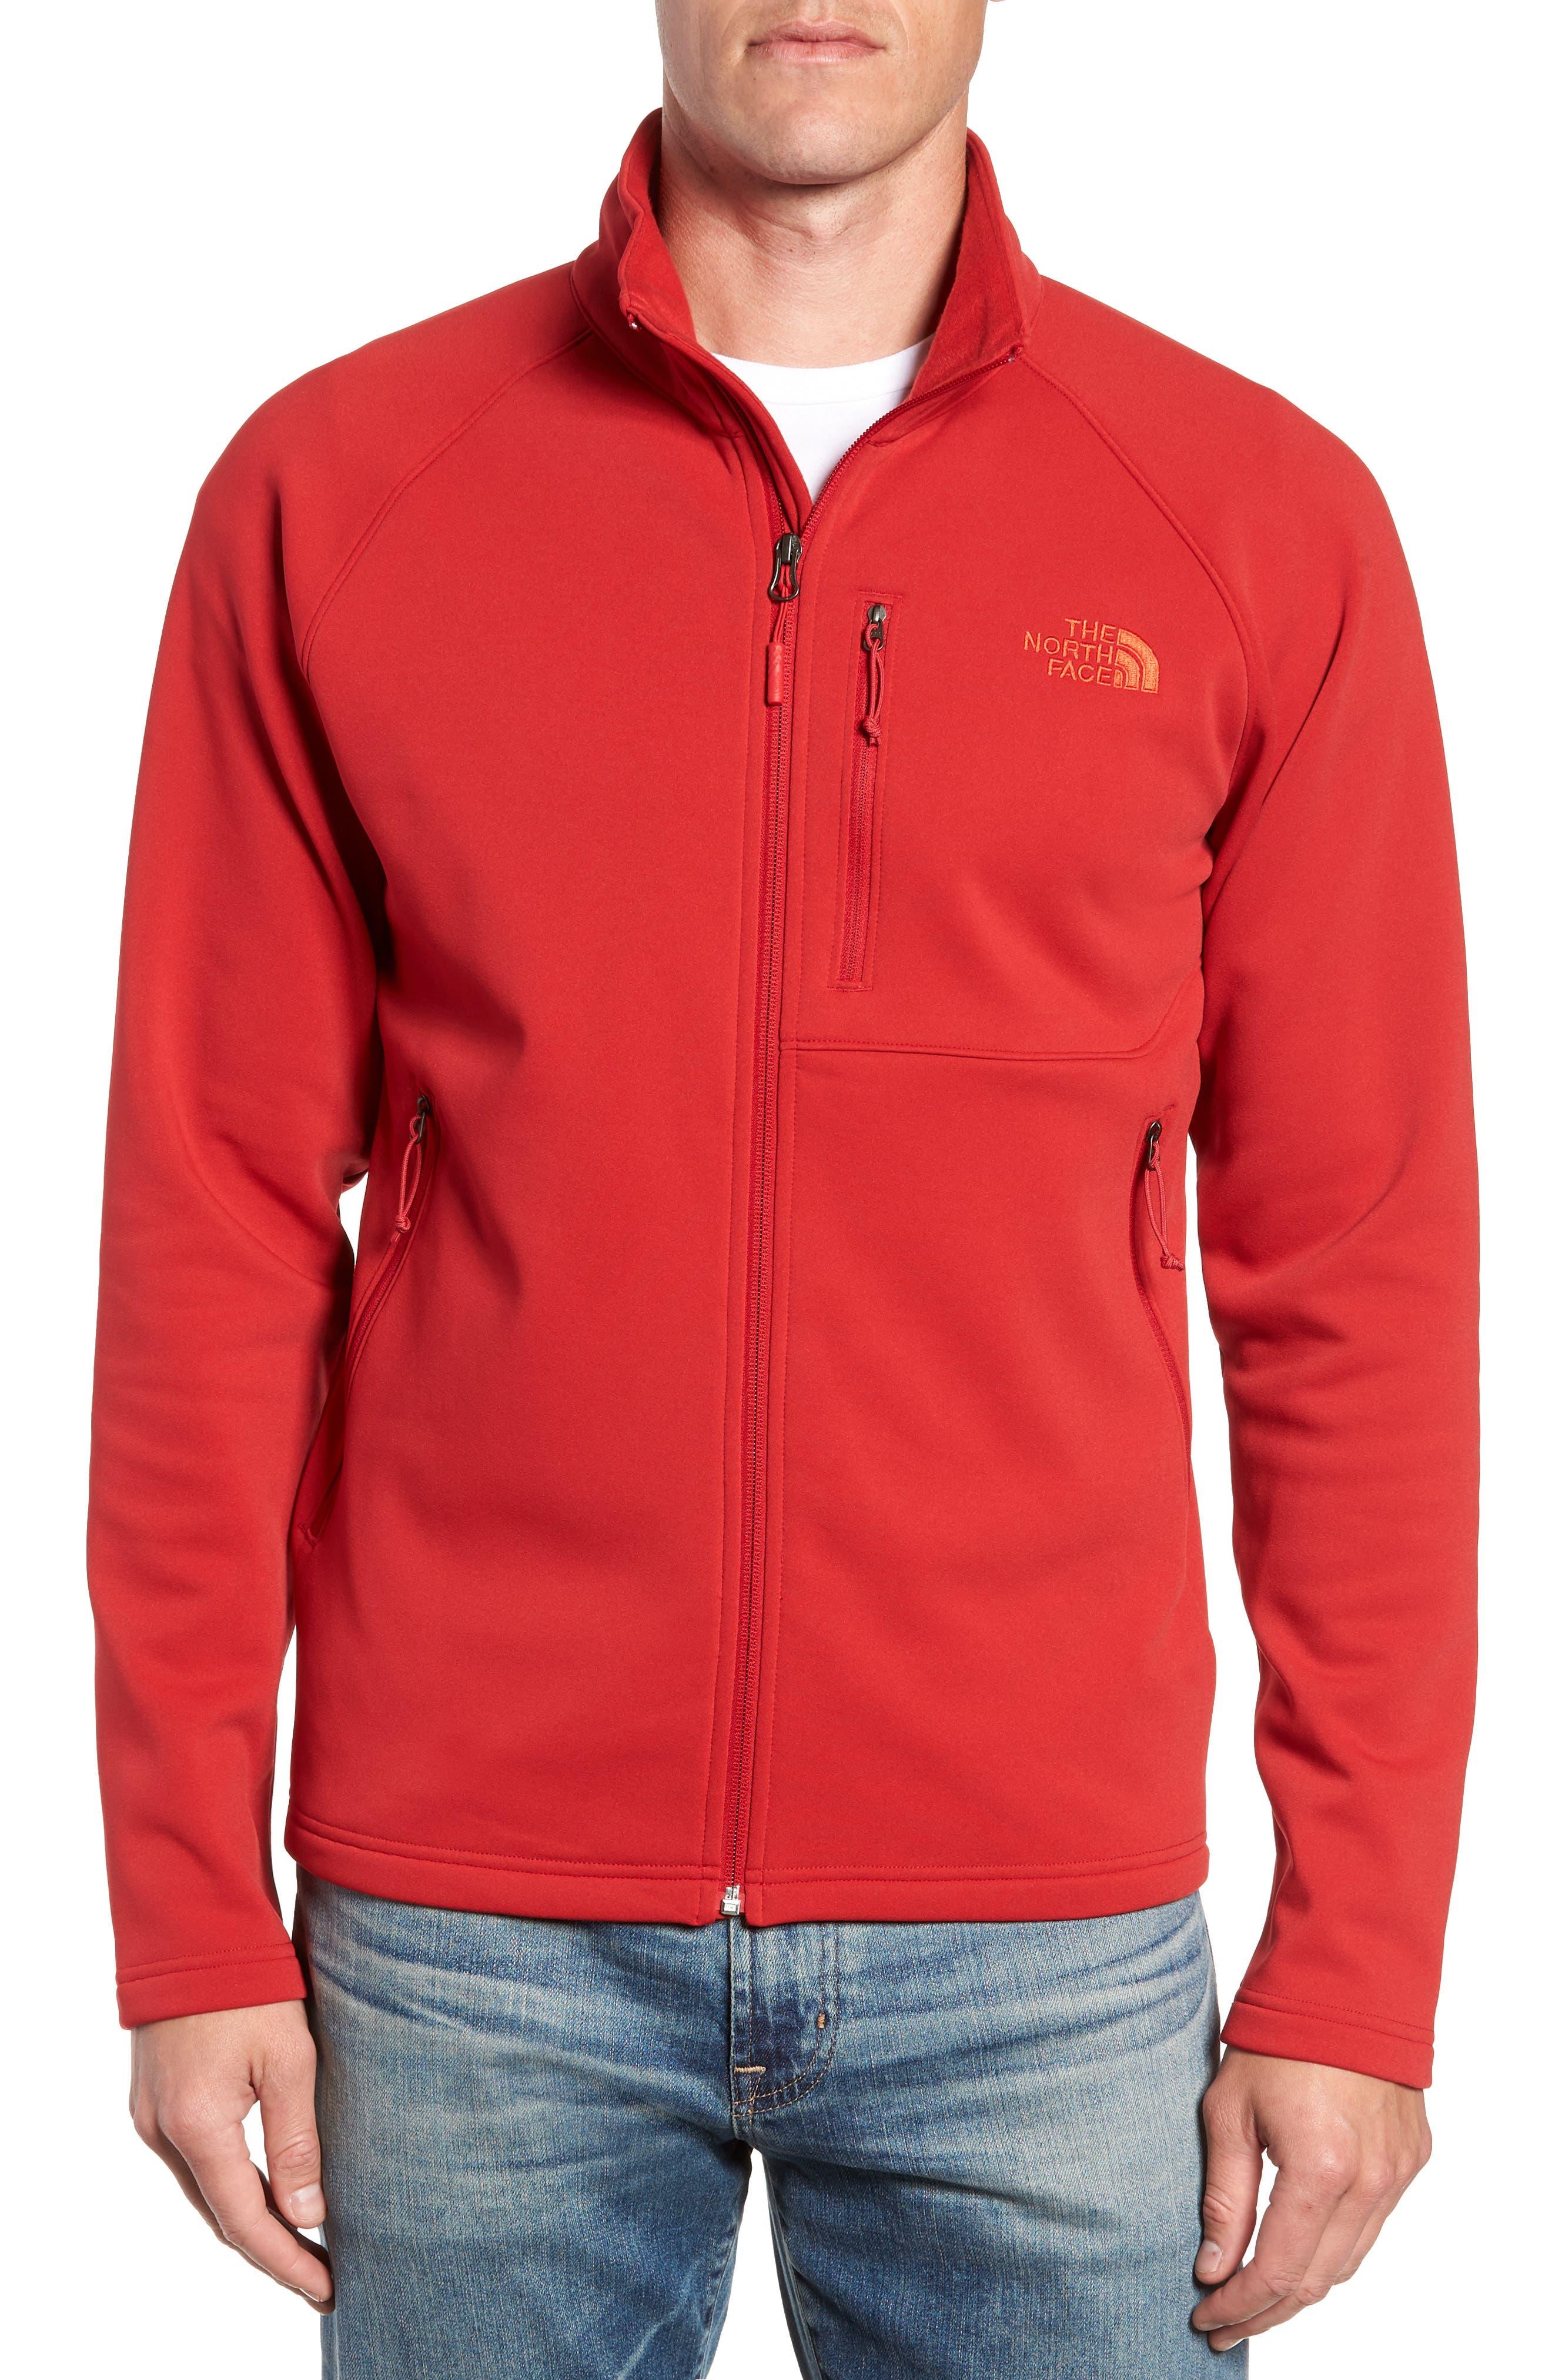 Tenacious Zip Jacket,                             Alternate thumbnail 4, color,                             RAGE RED